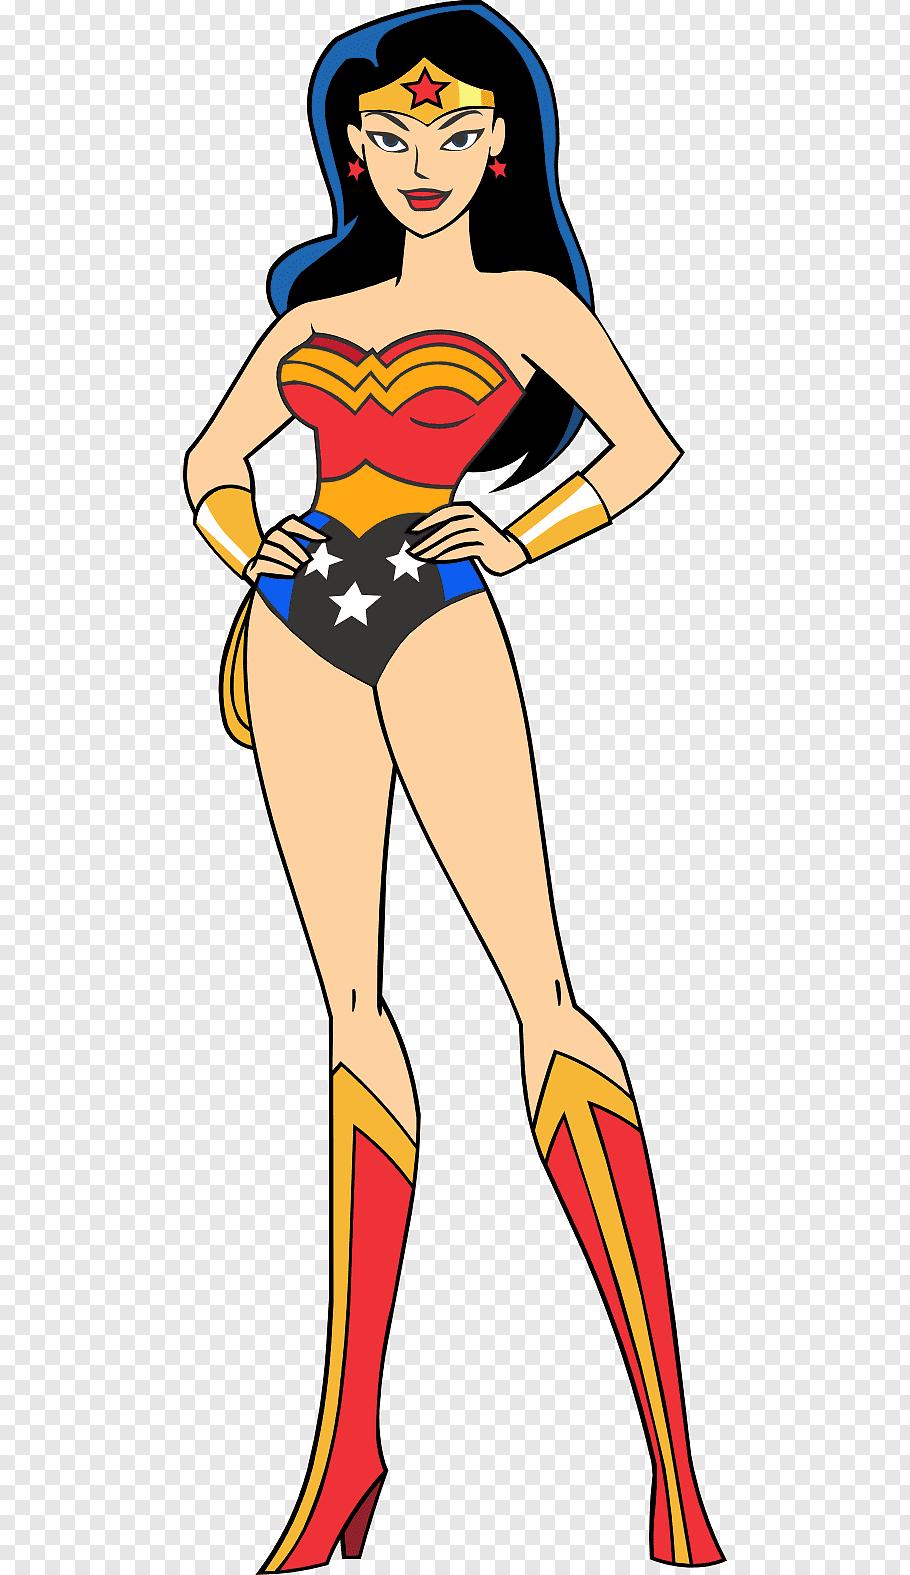 Wonder Woman illustration, Superman/Wonder Woman Superman.